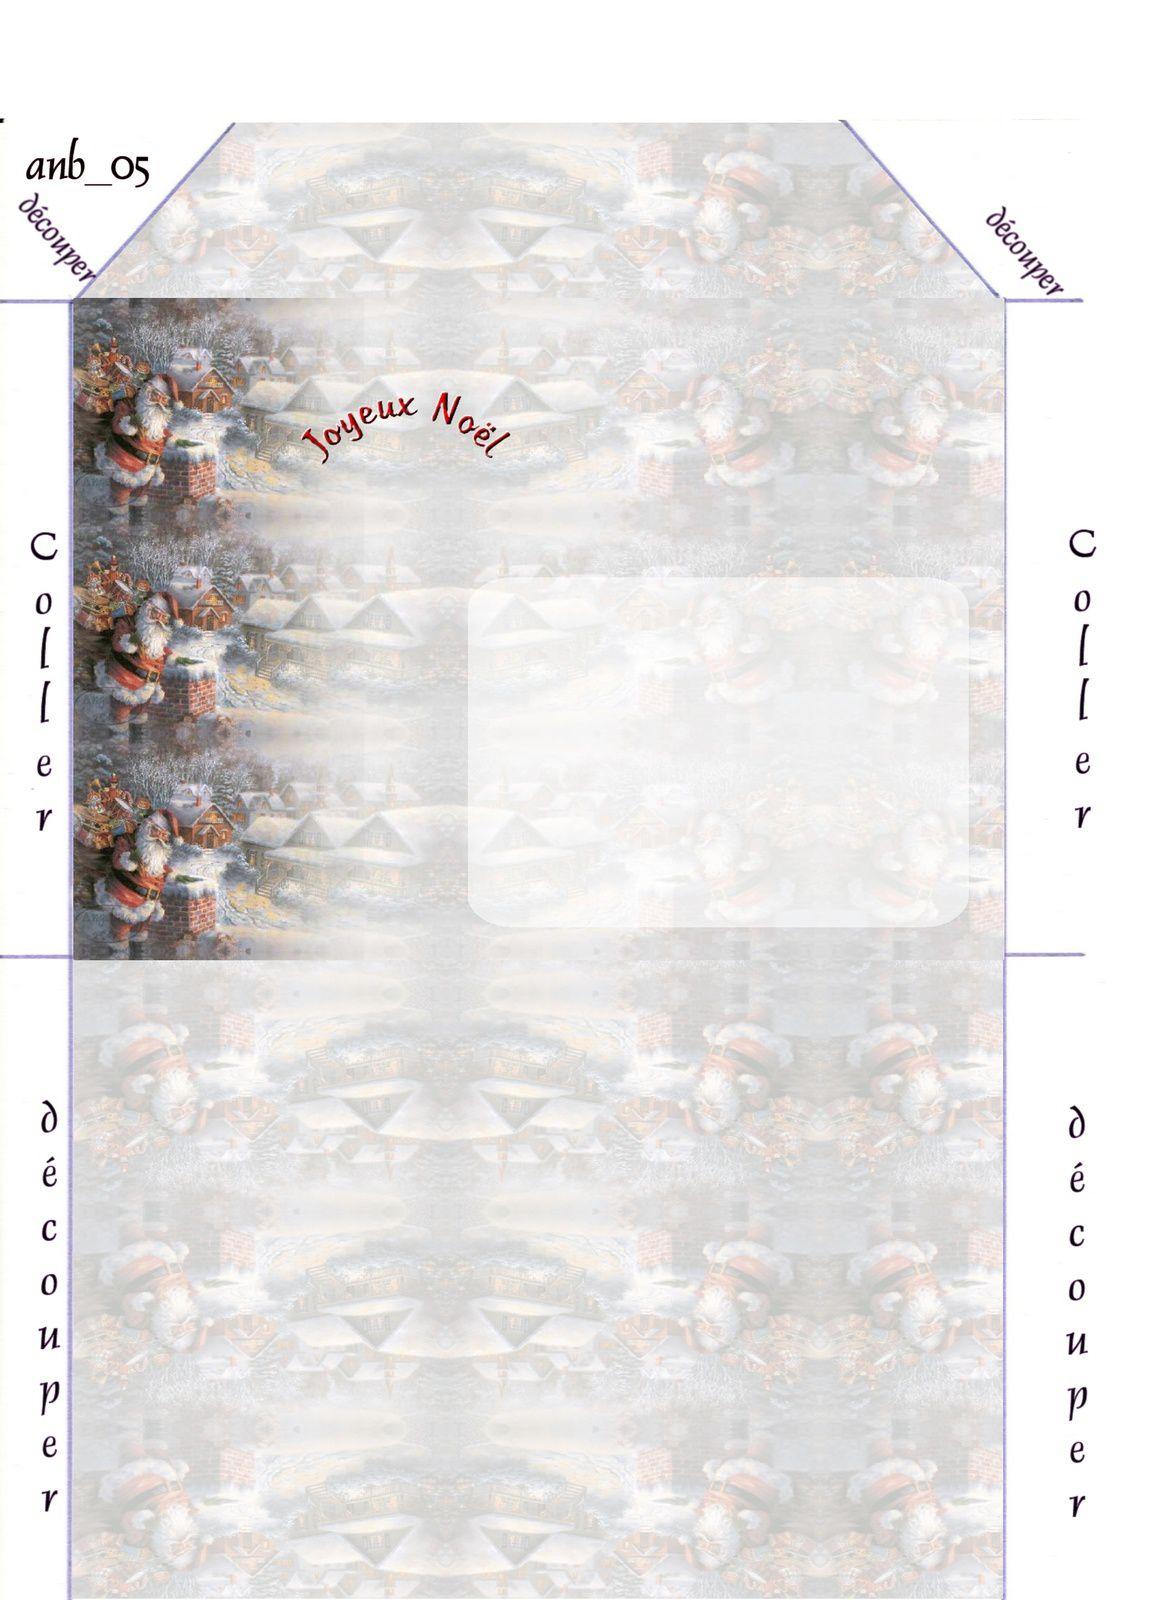 Joyeux Noël Père Noël toit Incredimail &amp&#x3B; Papier A4 h l &amp&#x3B; outlook &amp&#x3B; enveloppe &amp&#x3B; 2 cartes A5 &amp&#x3B; signets   joyeux_noel_santa_on_rooftop